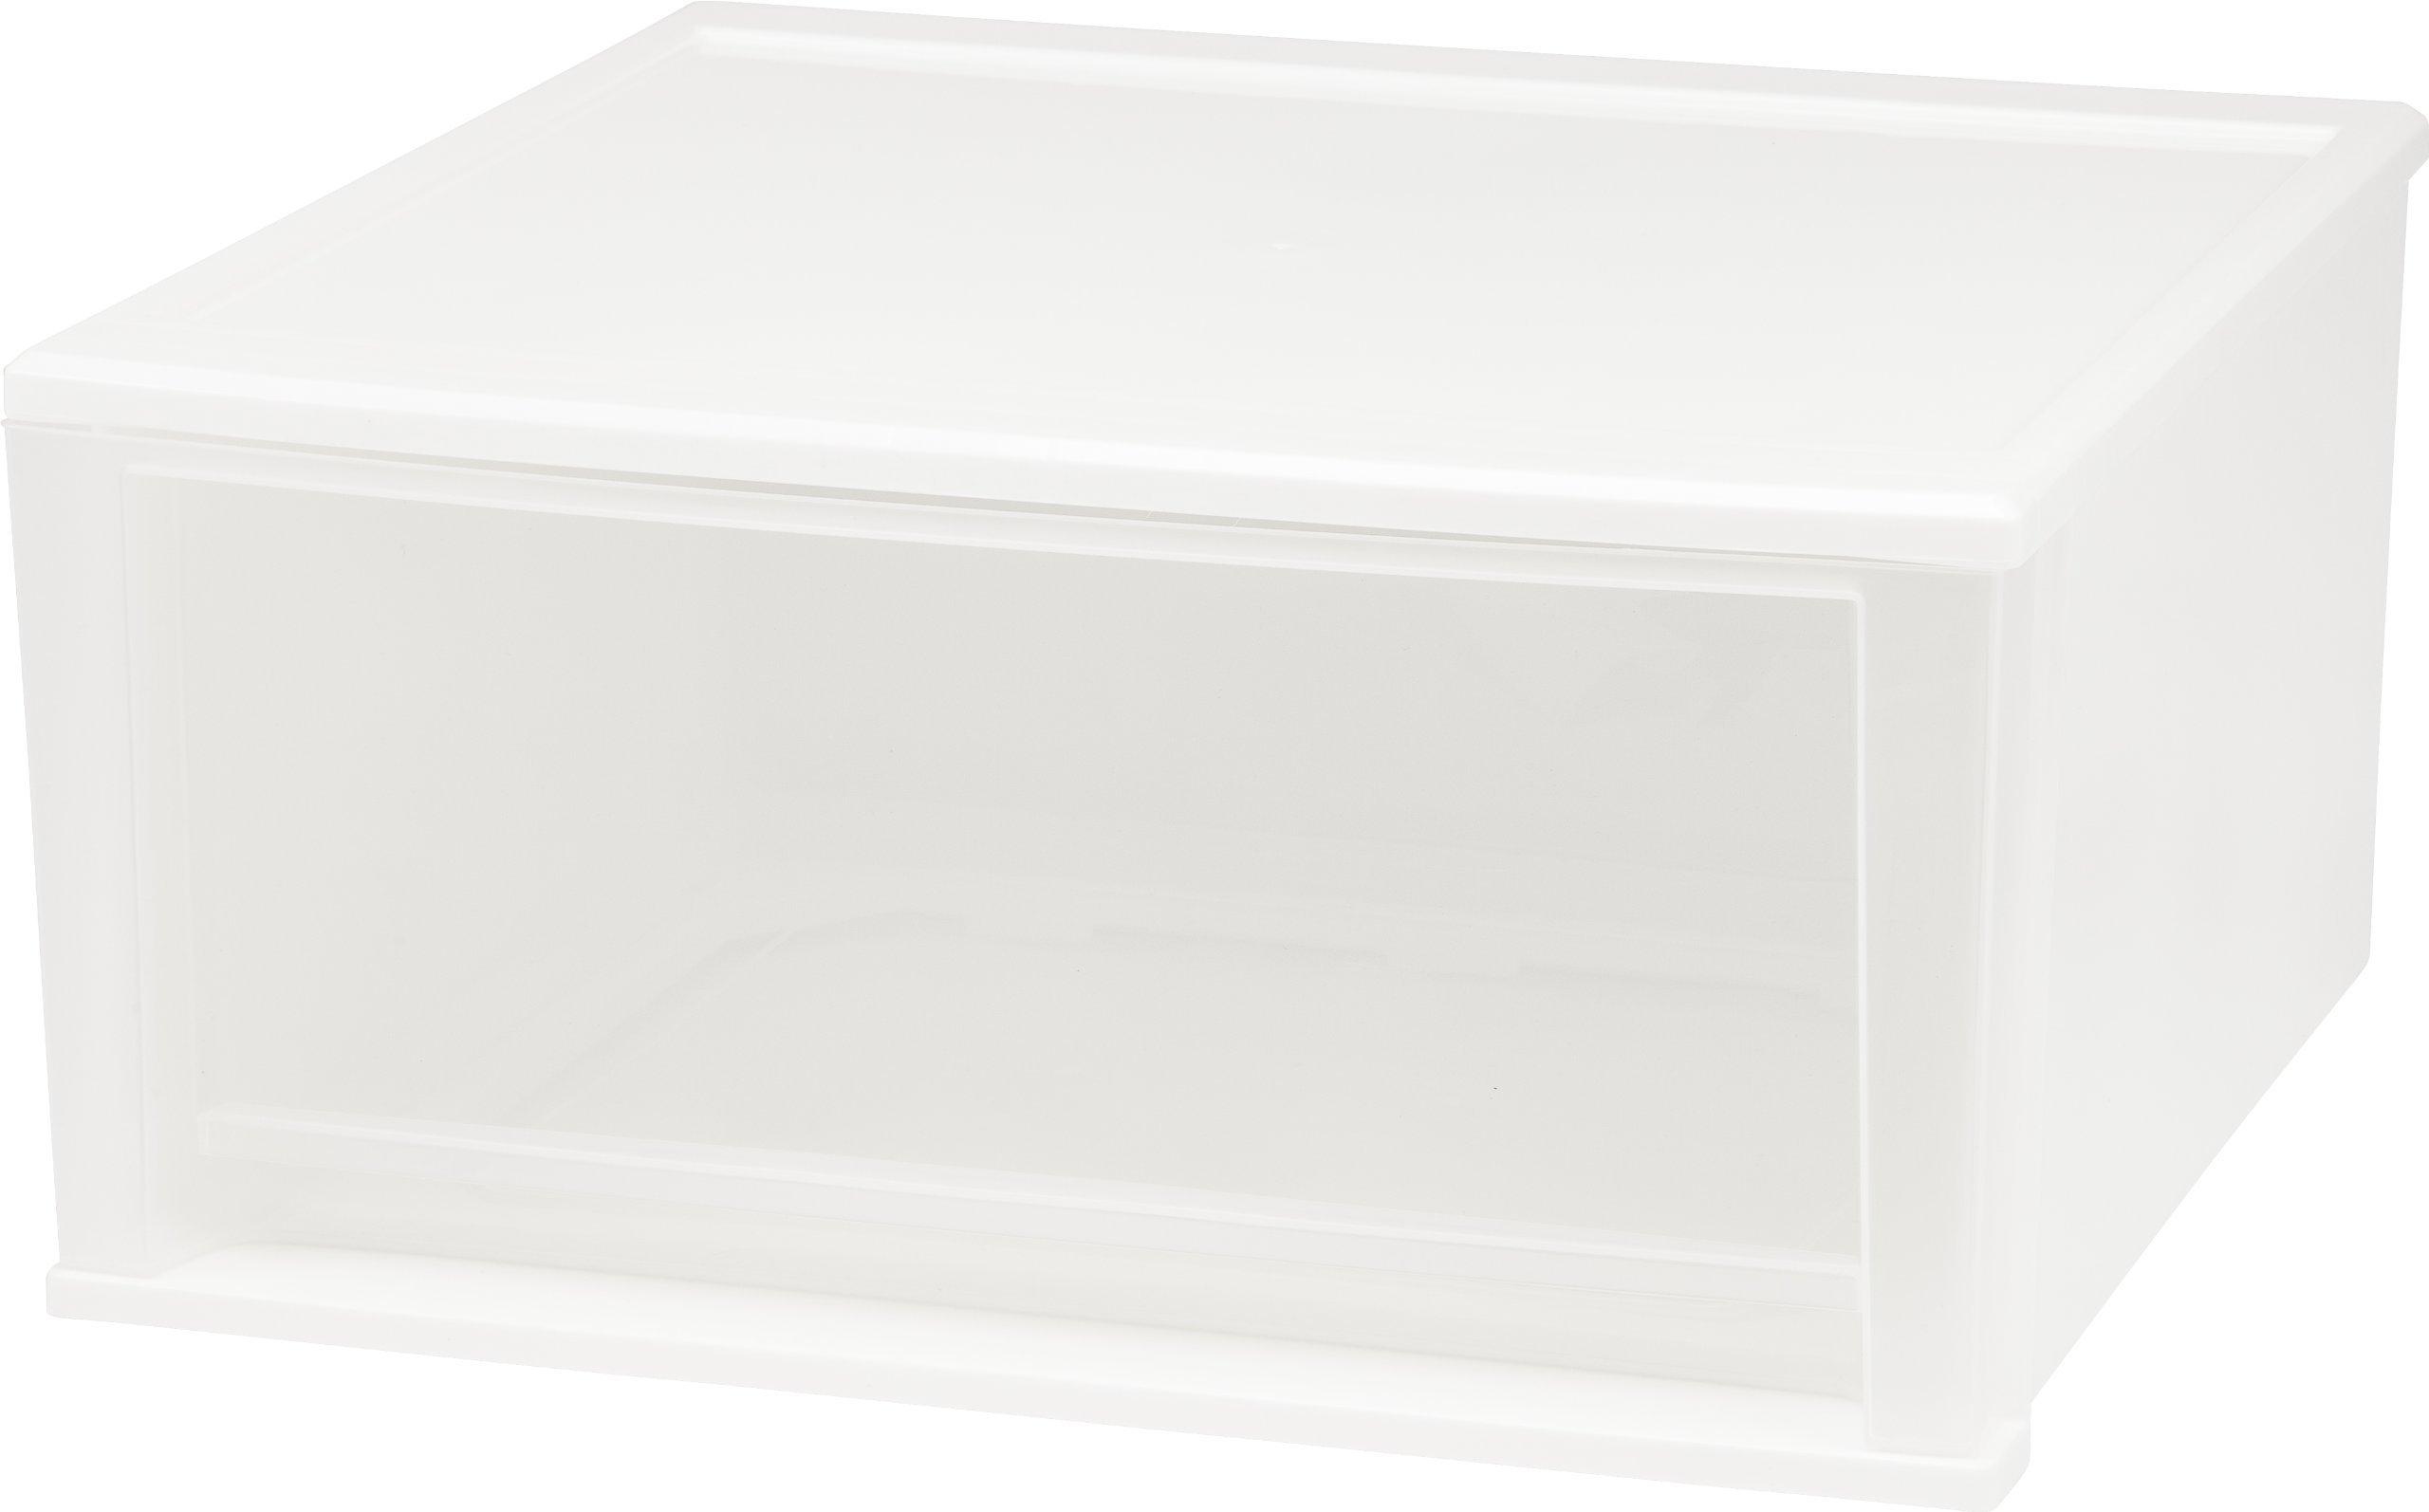 IRIS USA, Inc. SD-52 IRIS 51 Quart Stacking Drawer, 2 Pack, White, 2 Count (Renewed) by IRIS USA, Inc.